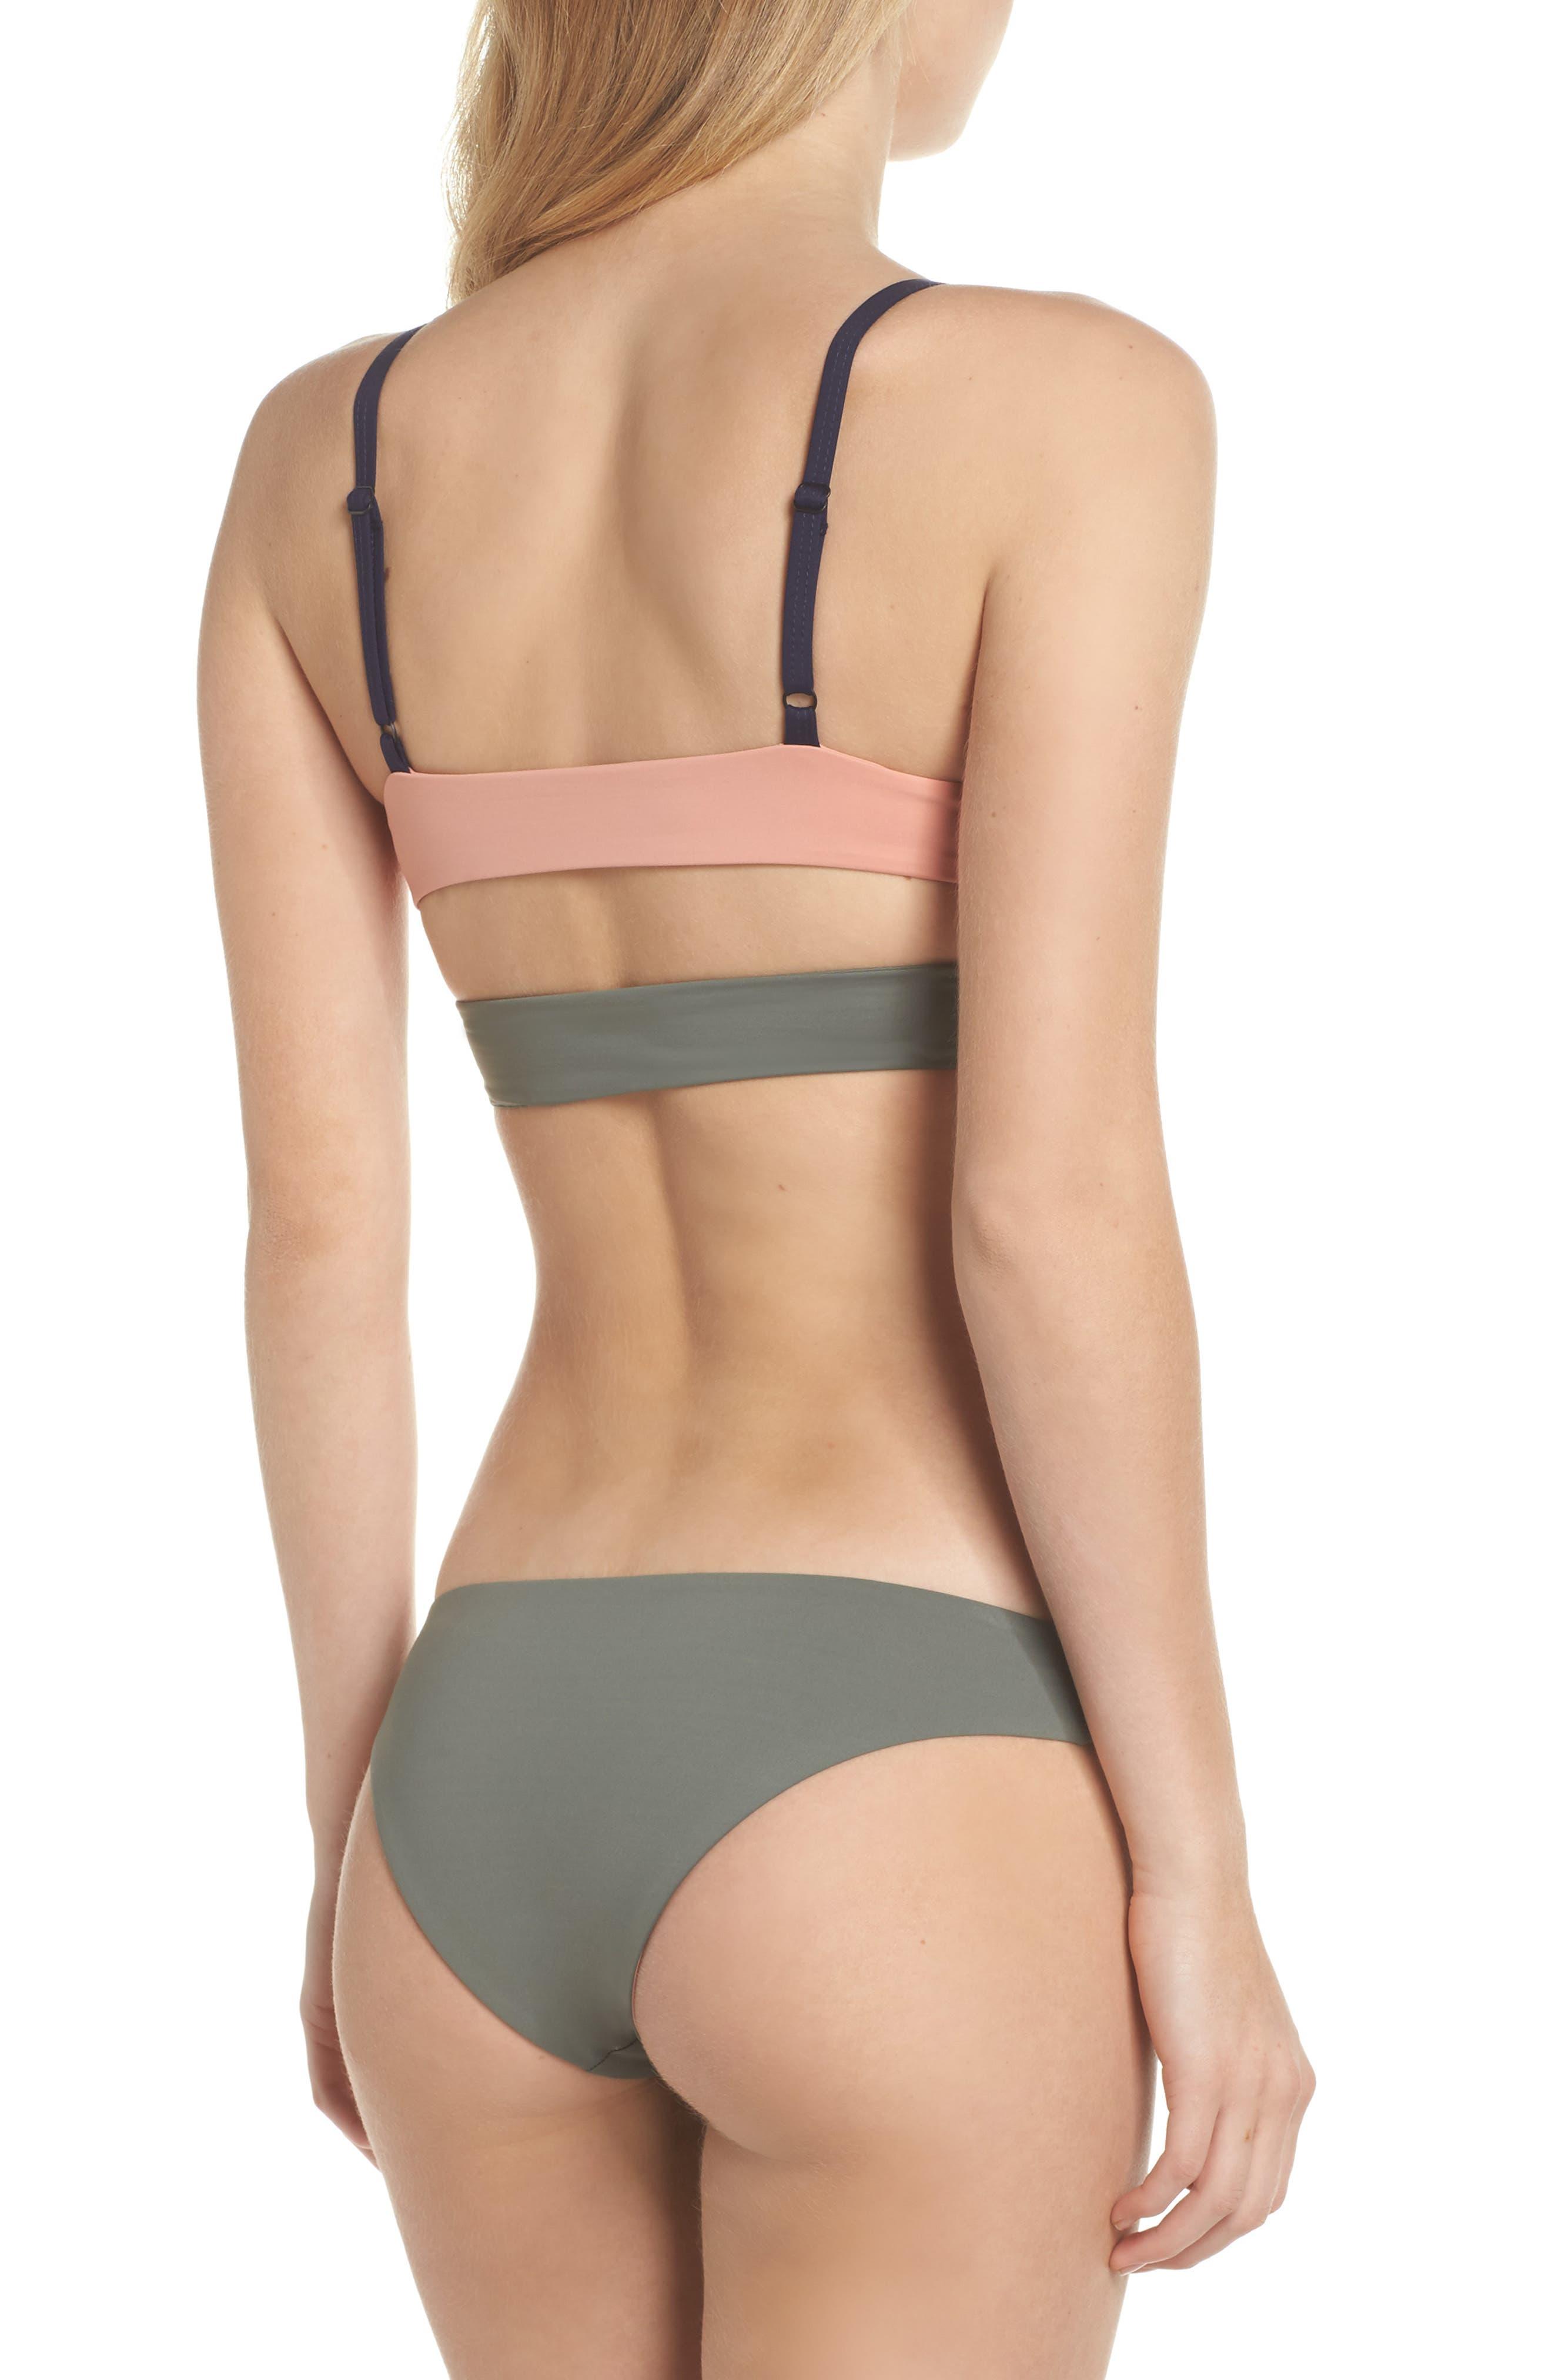 Jaclyn Hipster Bikini Bottoms,                             Alternate thumbnail 6, color,                             Desert Clay/ Cove Grey